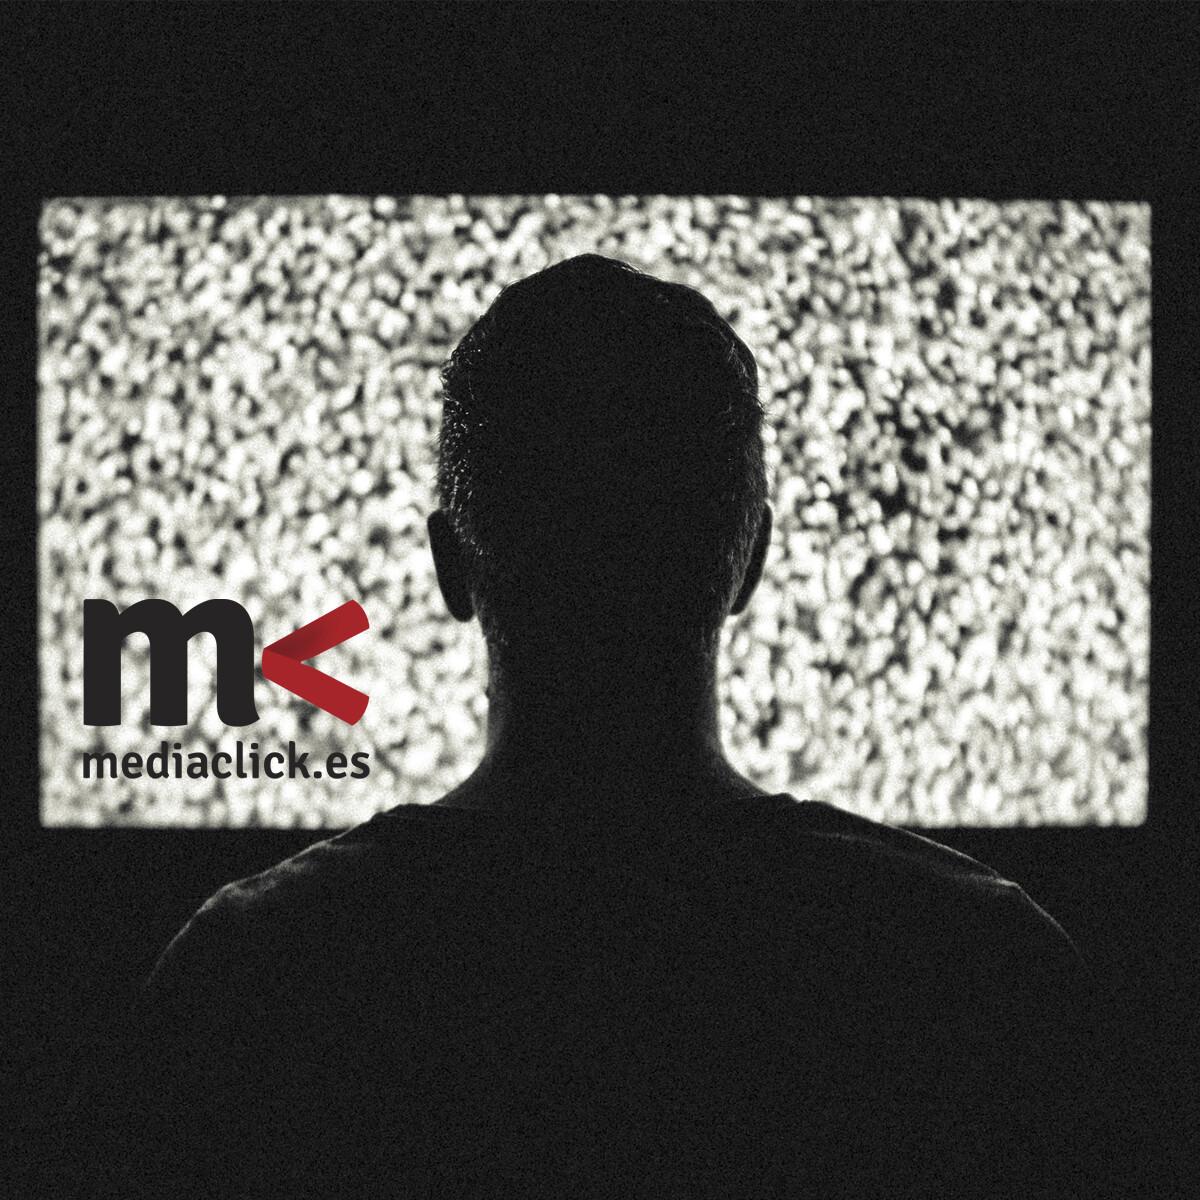 Agencia marketing digital. Mediaclick